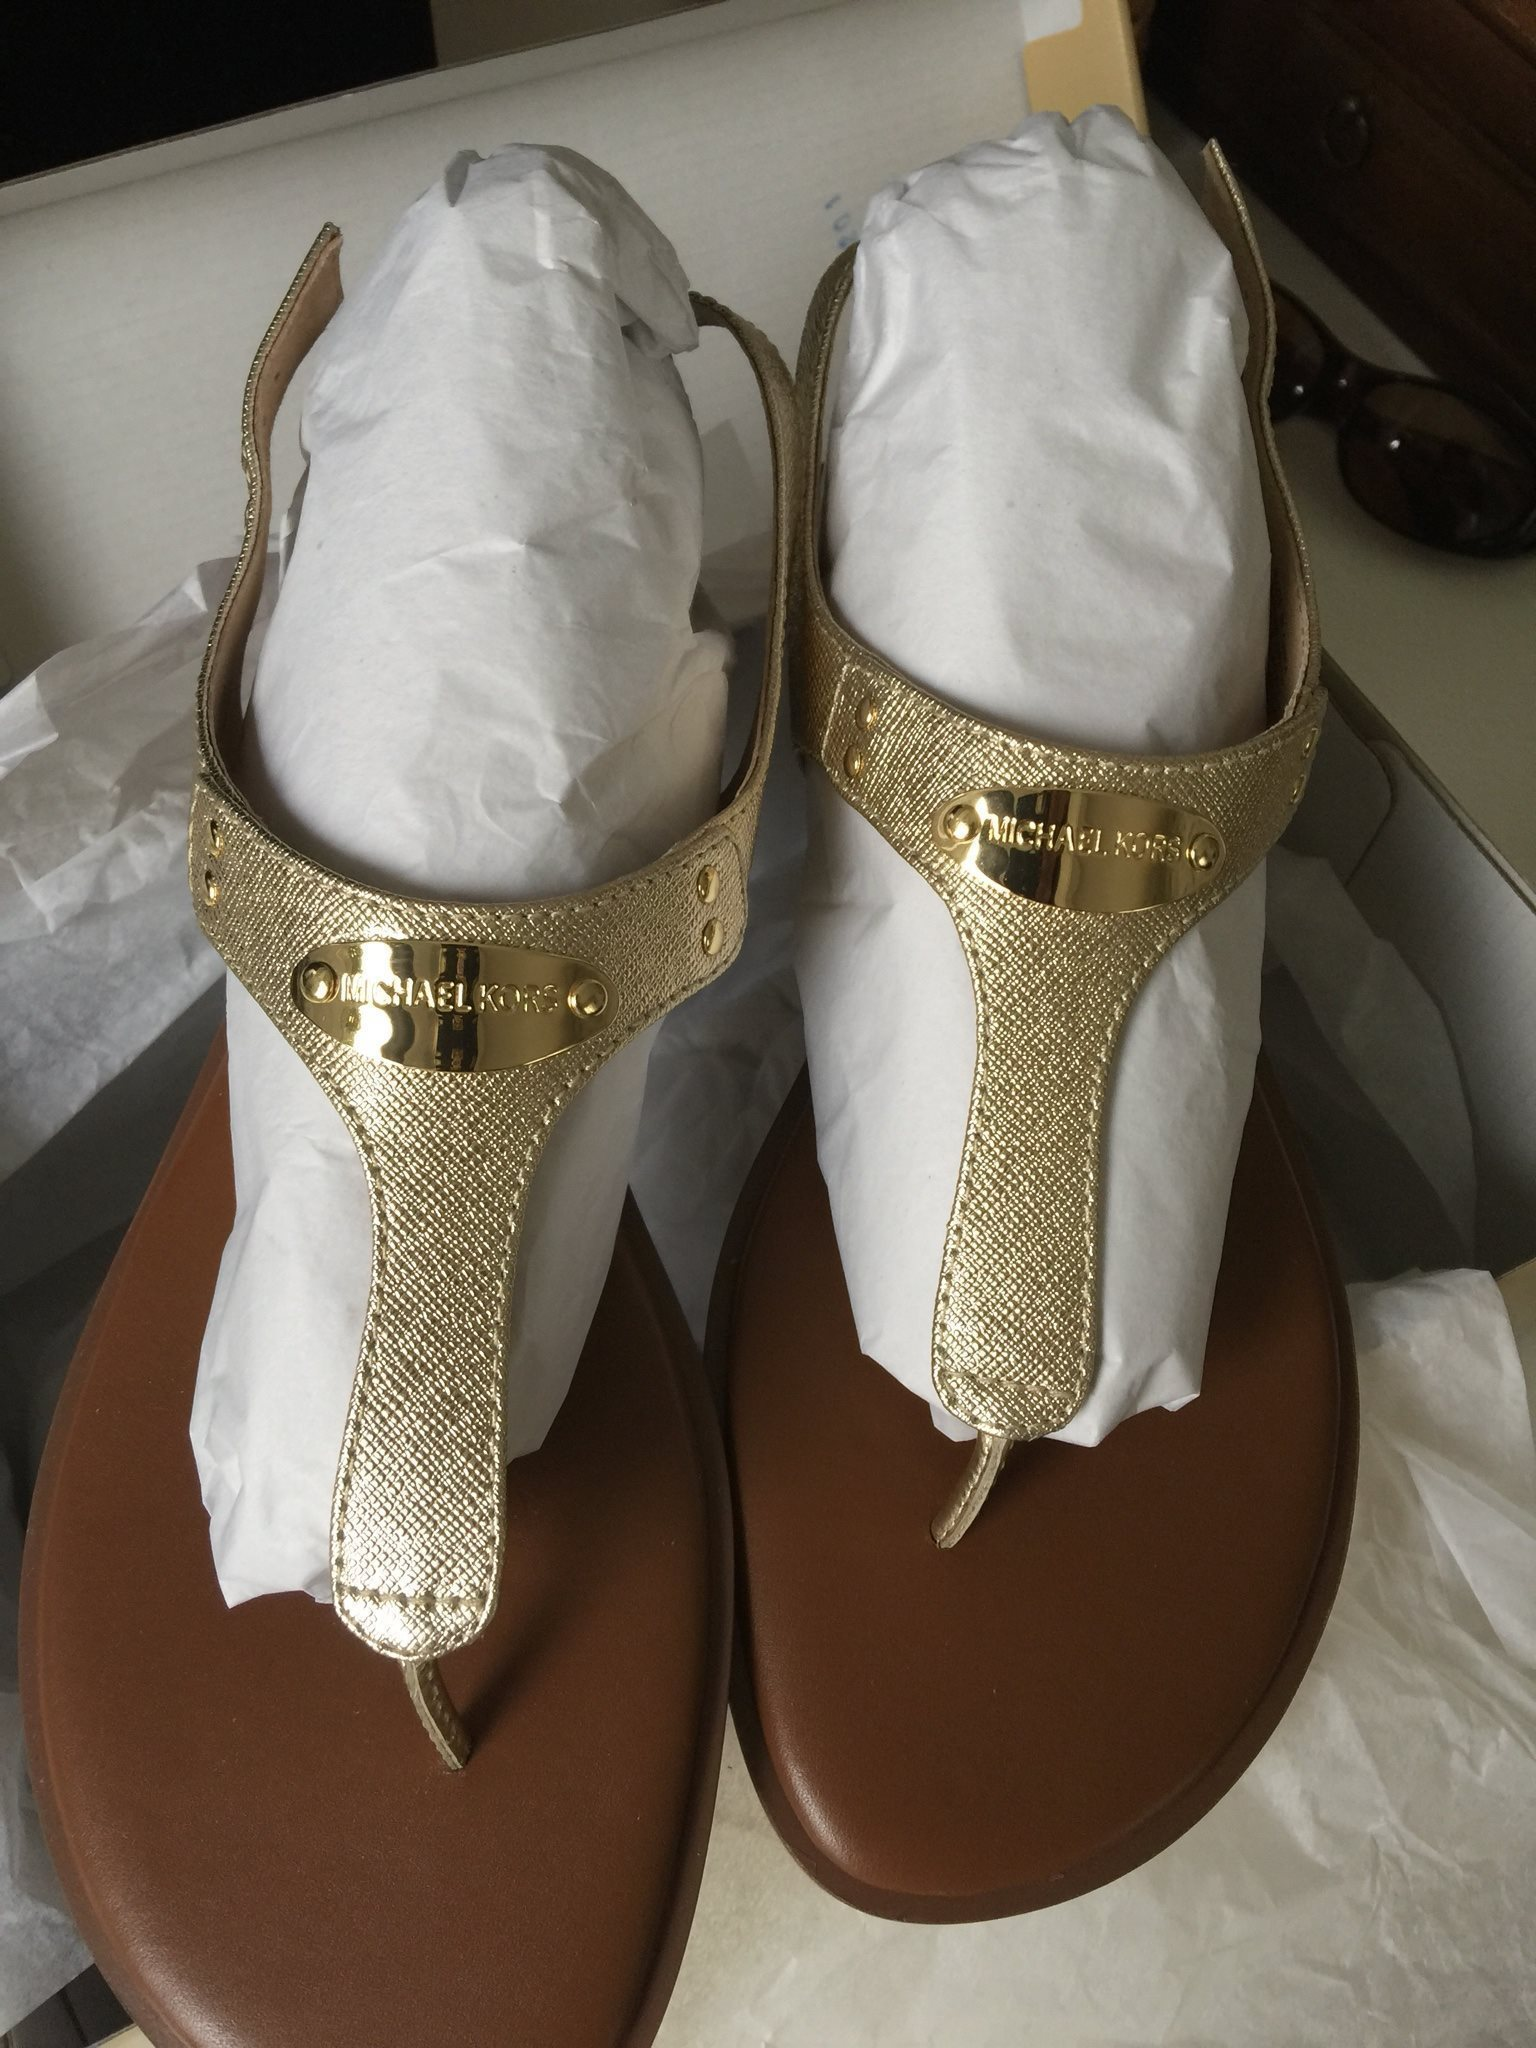 76e5efa535 Helt nya aldrig använda Michael Kors sandaler s.. (335847611) ᐈ Köp ...